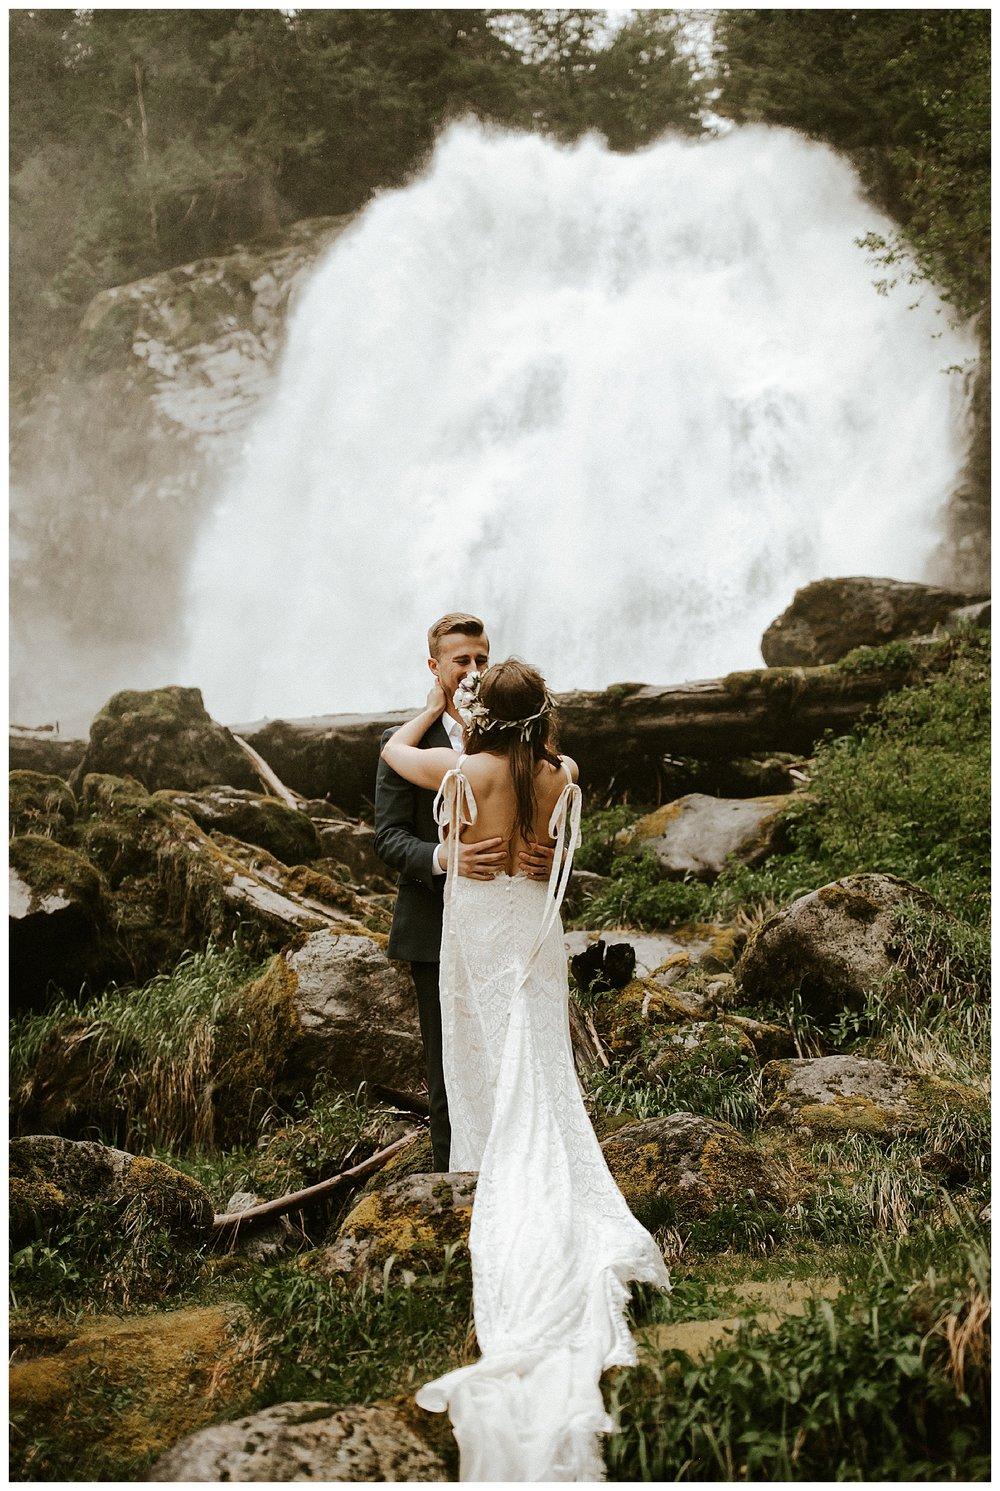 Spokane Seattle PNW Wedding Photographer Cassie Trottier Photography